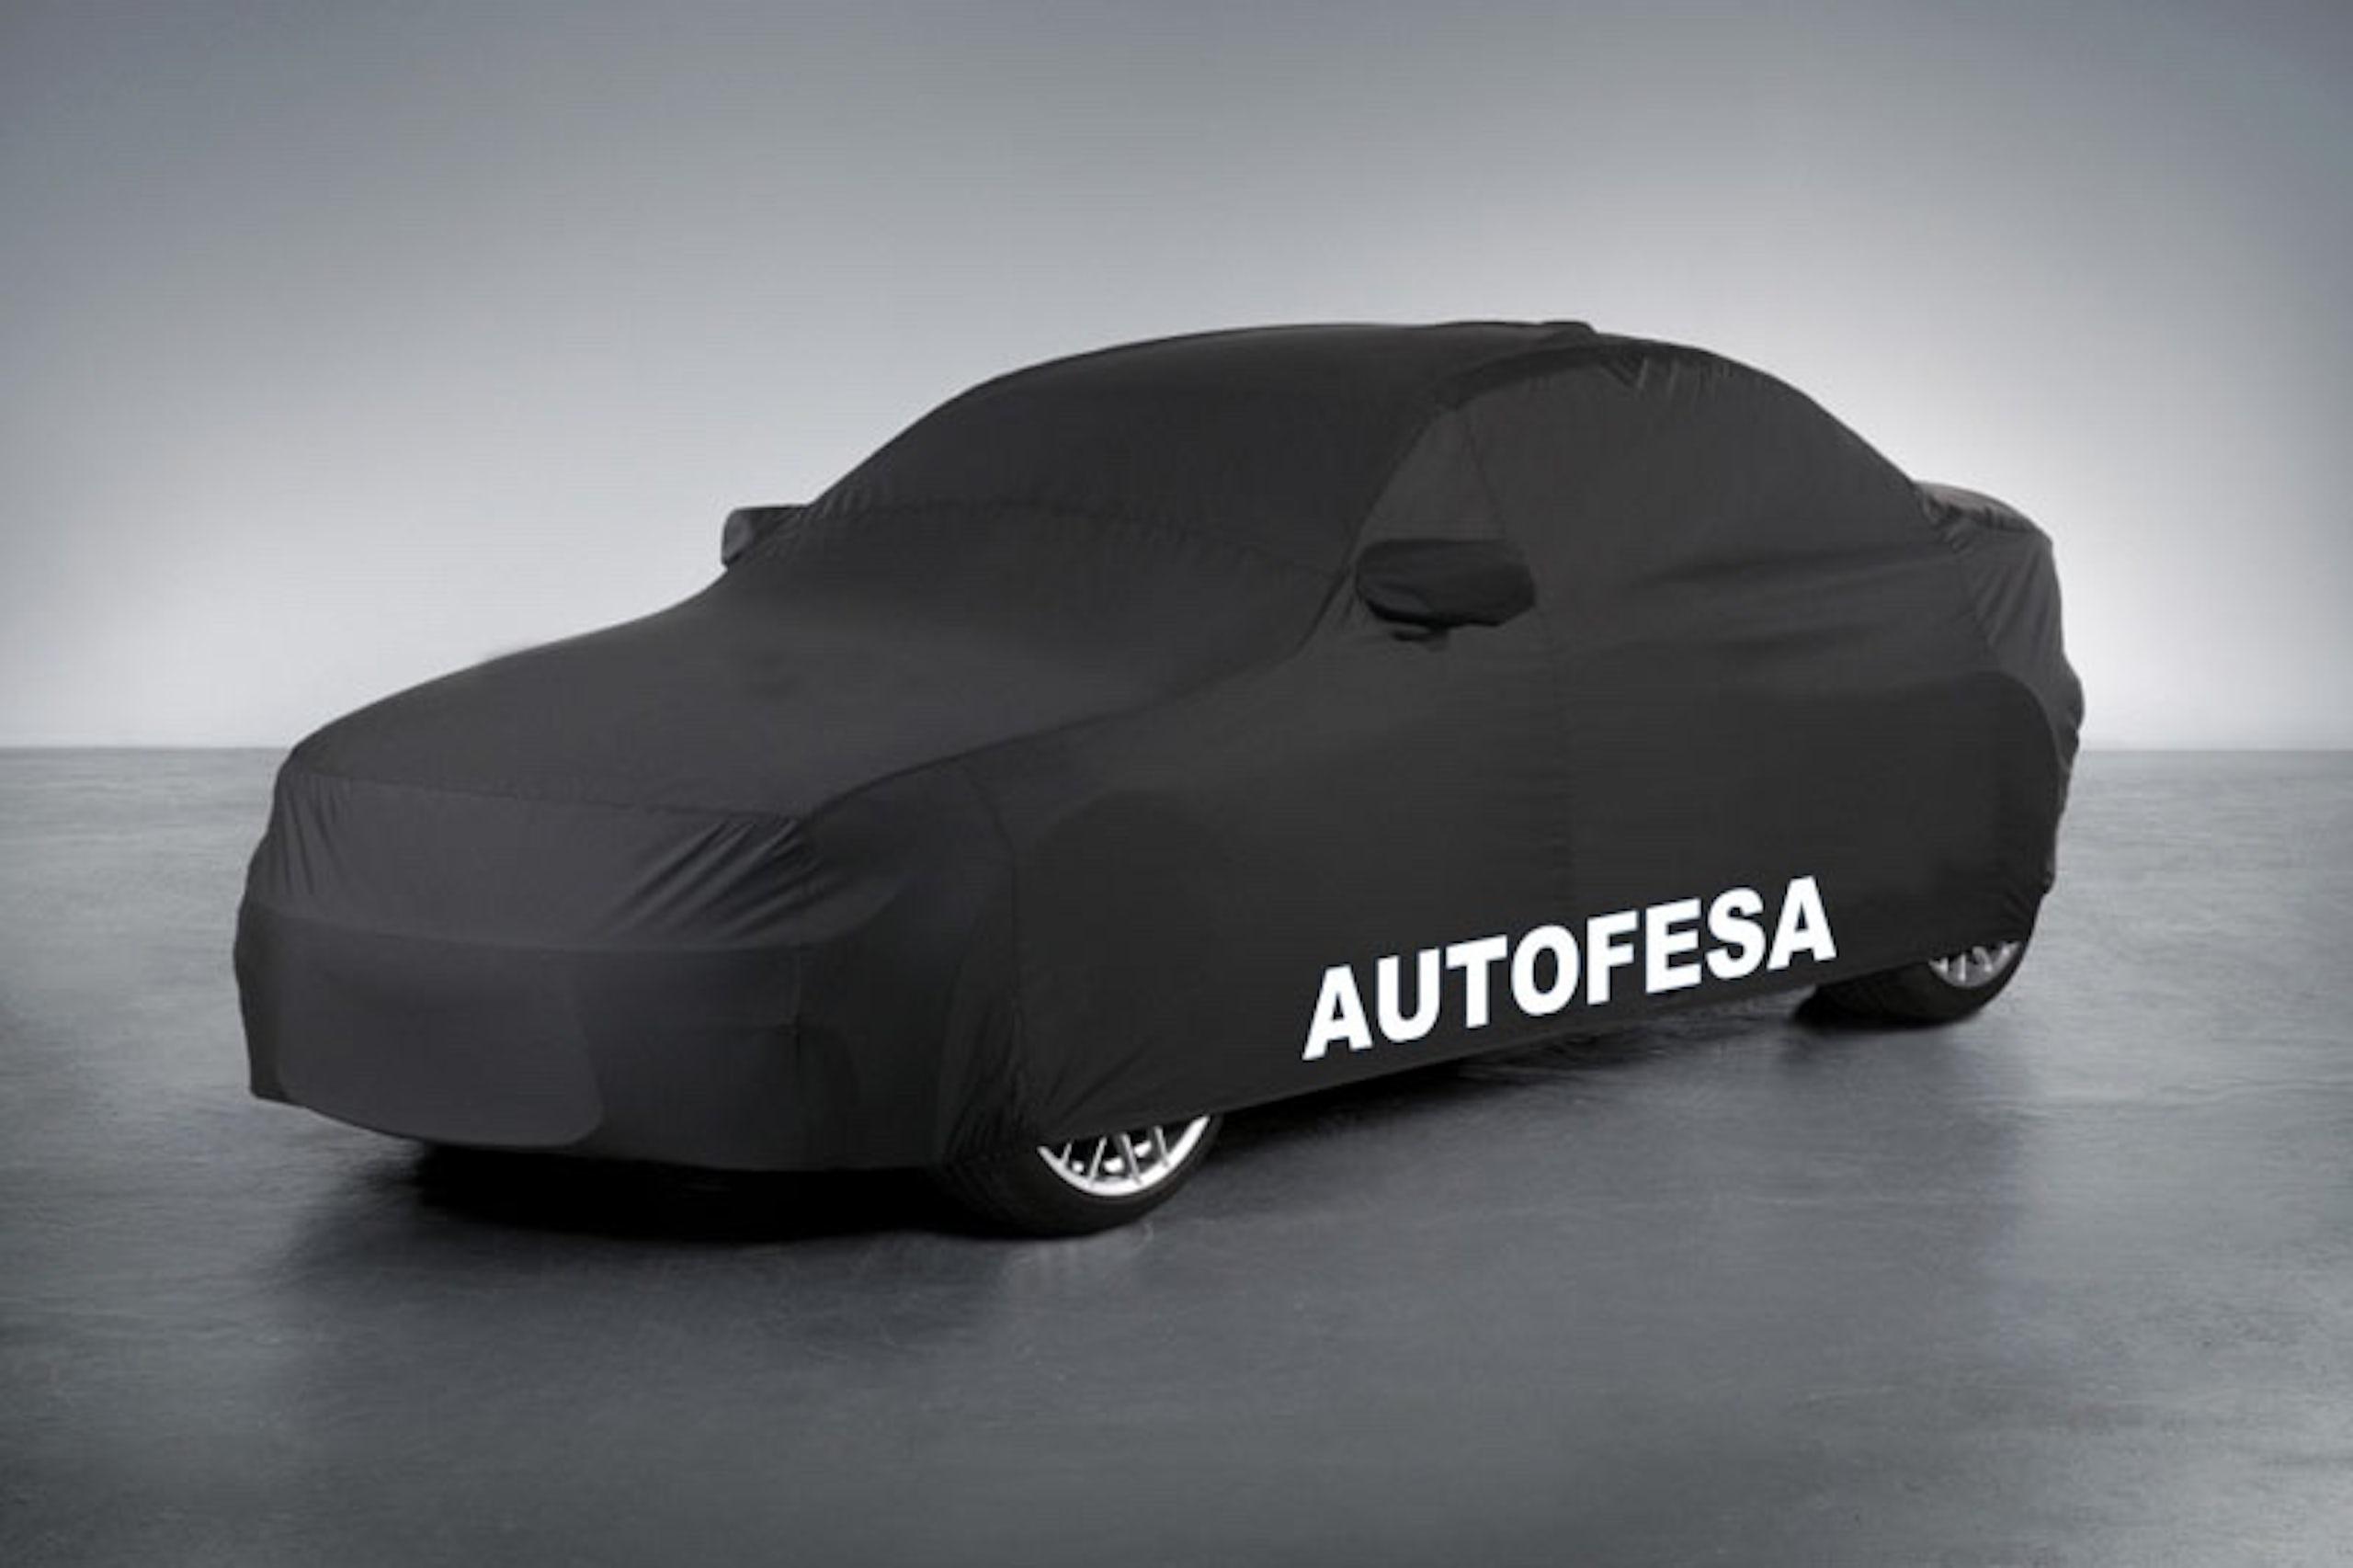 Volvo Xc 60 2.0 T8 Twin Momentum Hybrido Enchufable AWD Auto 407cv 5p S/S - Foto 30